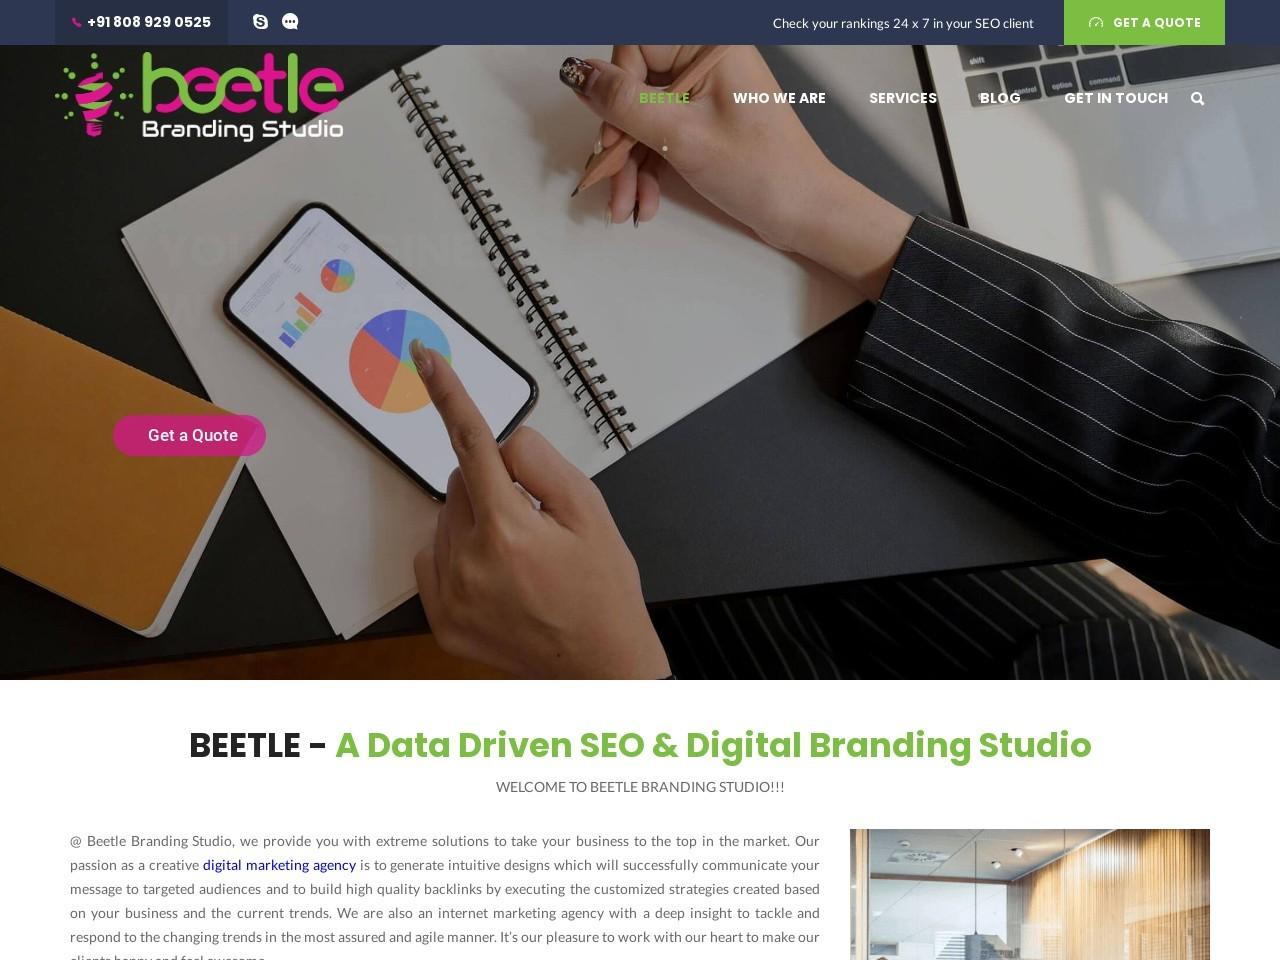 Search Engine Optimization to Increase Organic Traffic   Beetle Branding Studio